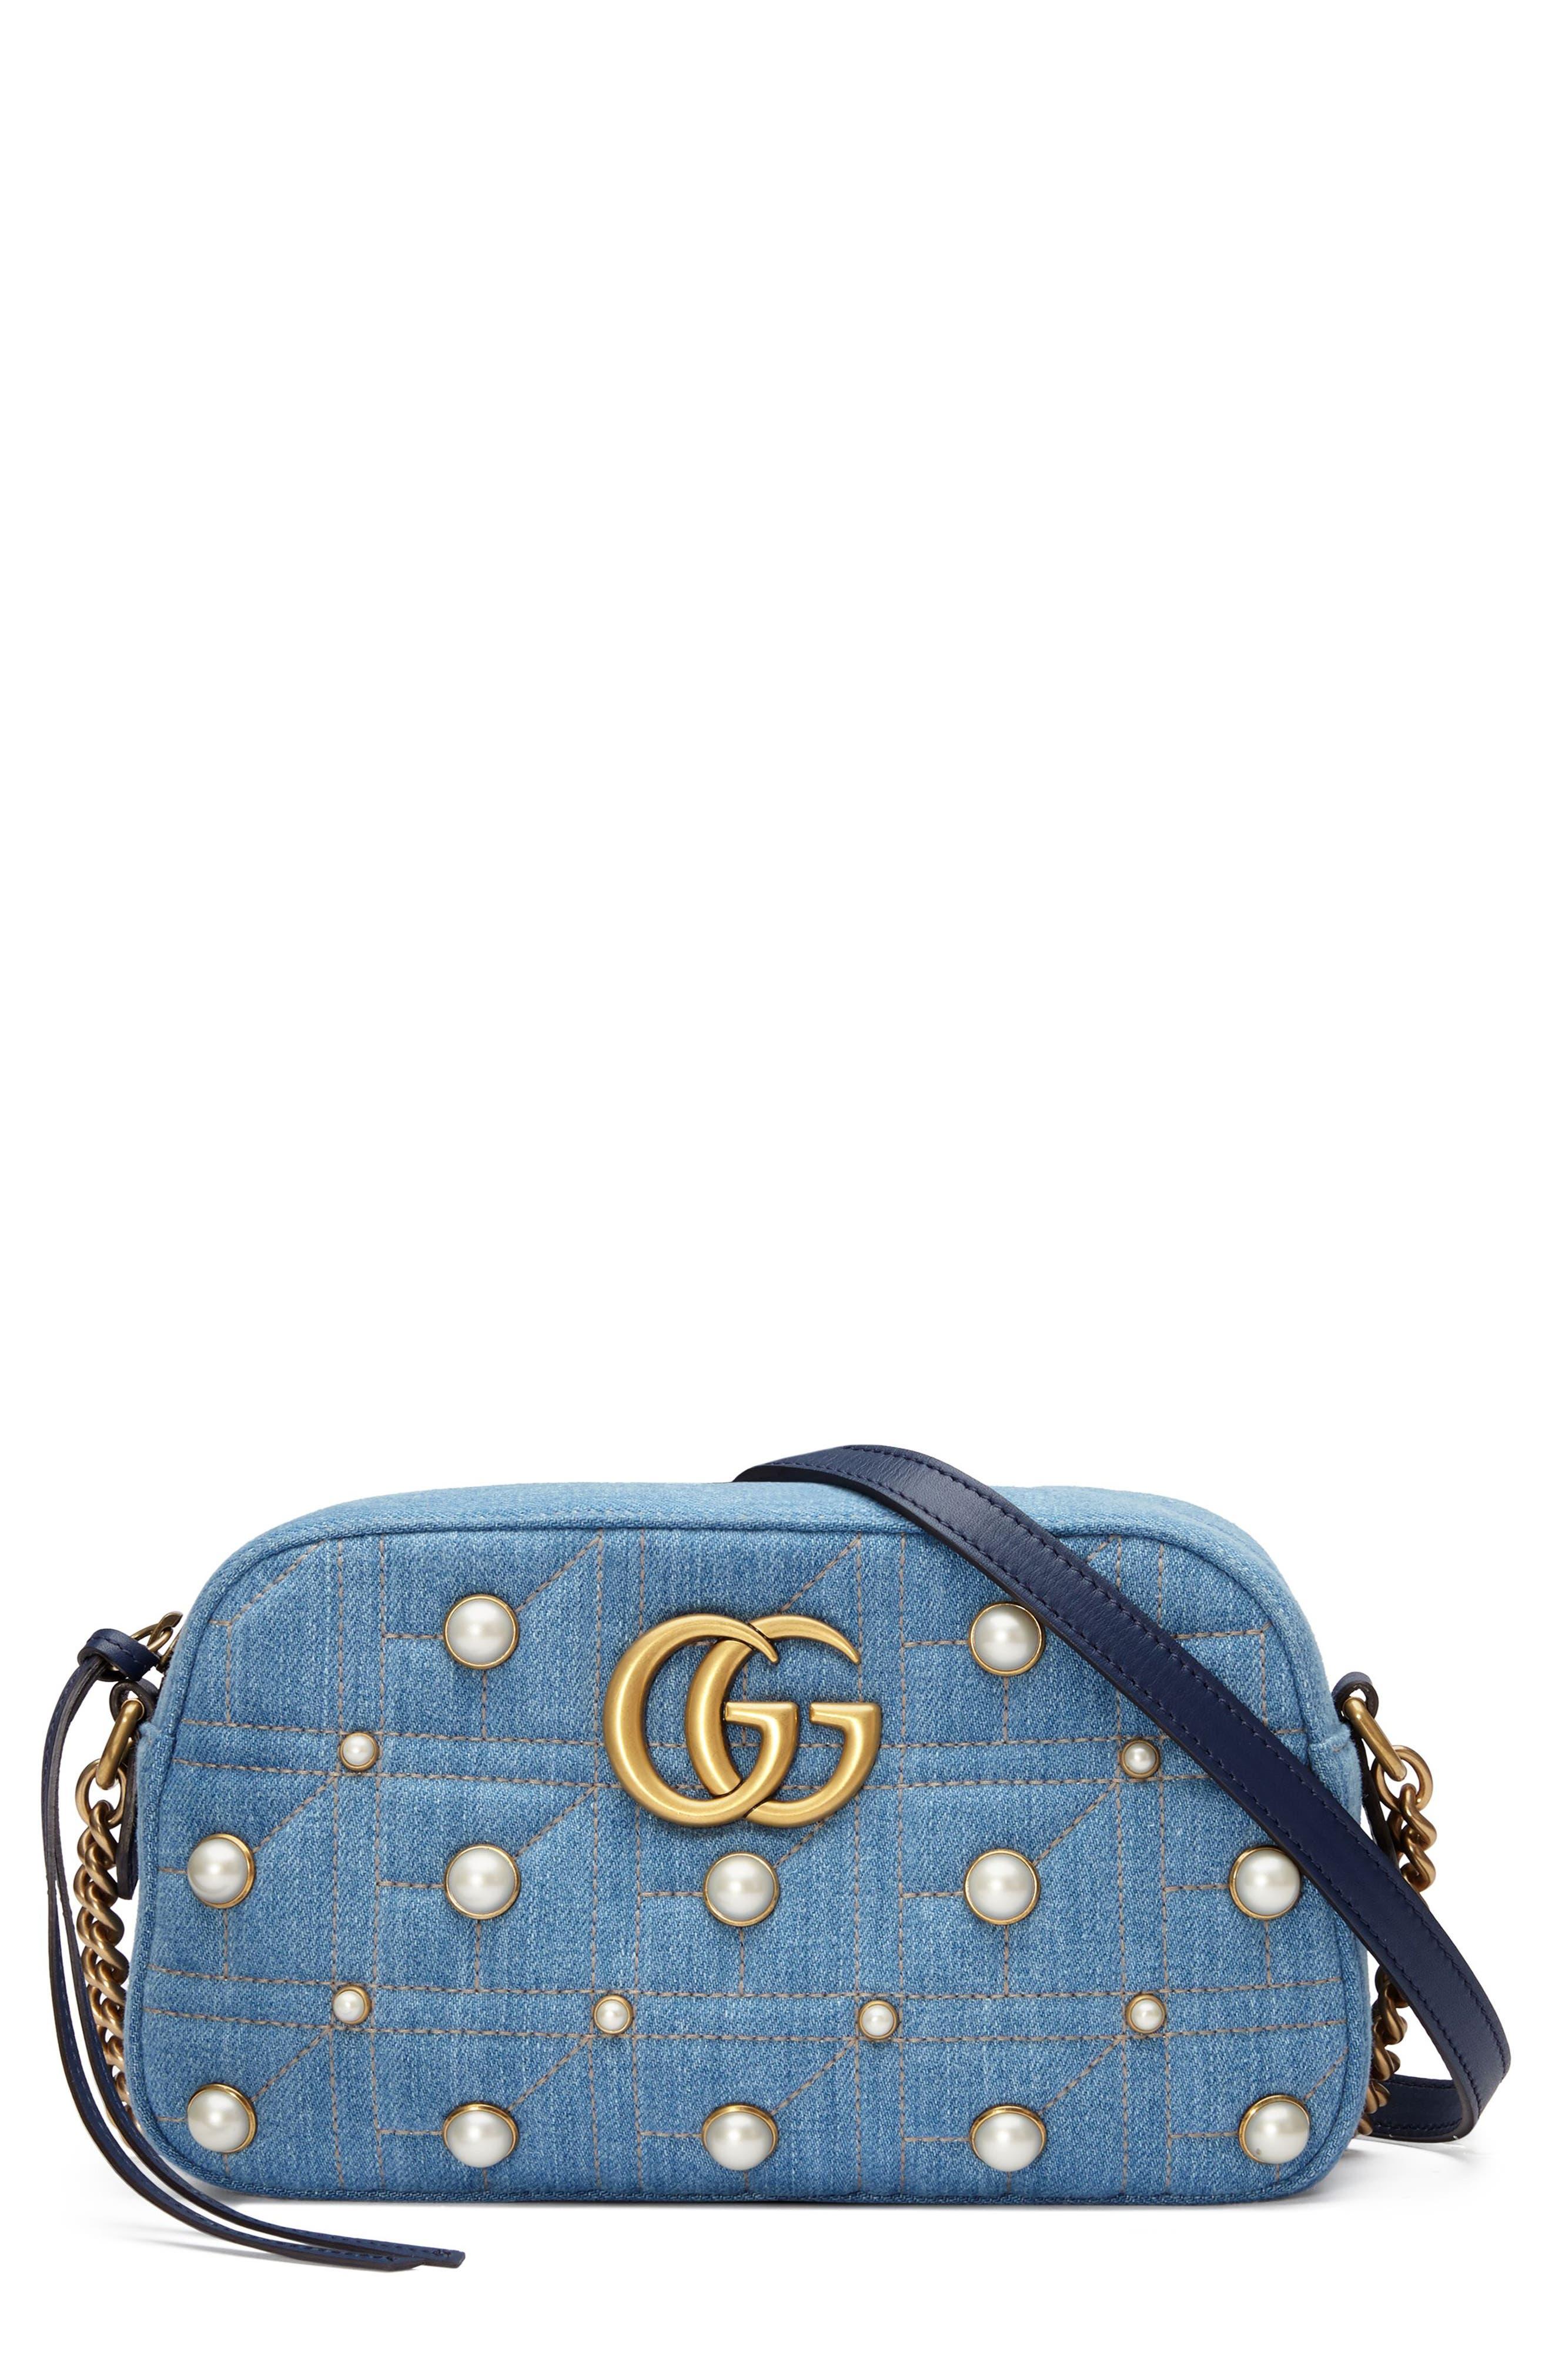 Gucci Marmont 2.0 Imitation Pearl Embellished Denim Camera Bag